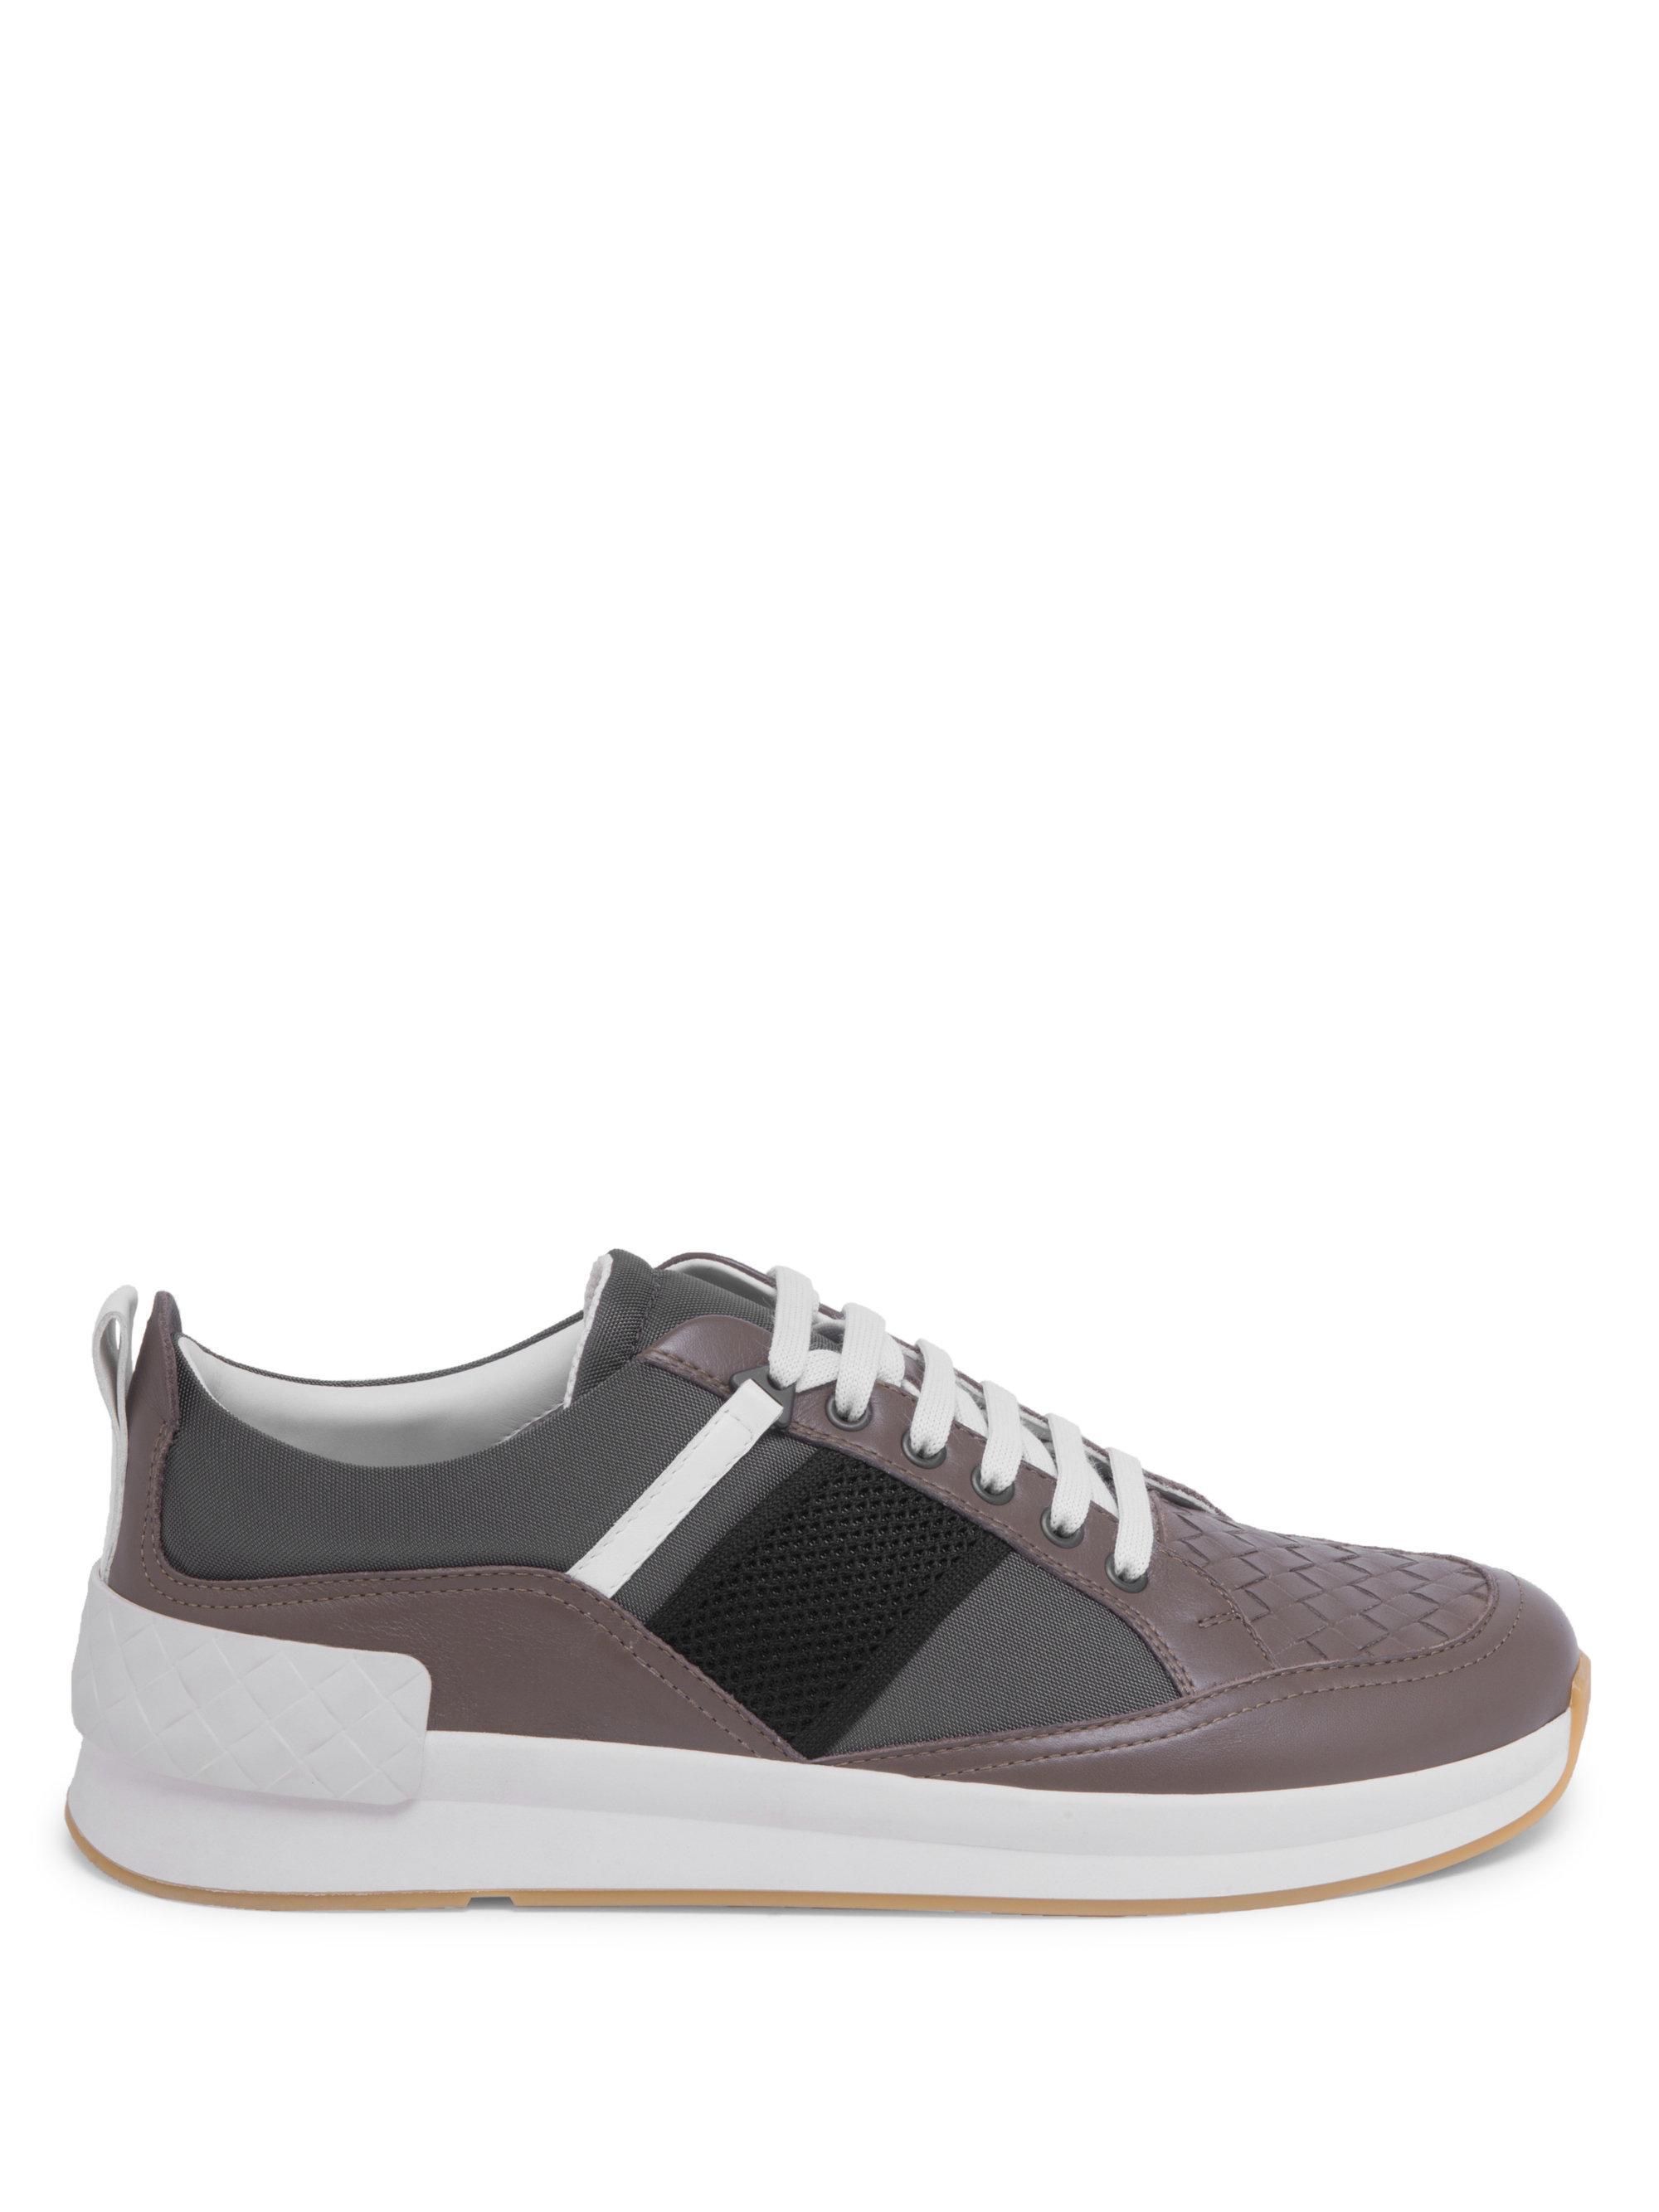 Bottega Veneta Side Stripe Leather Low-Top Sneakers di4P1e2pnt